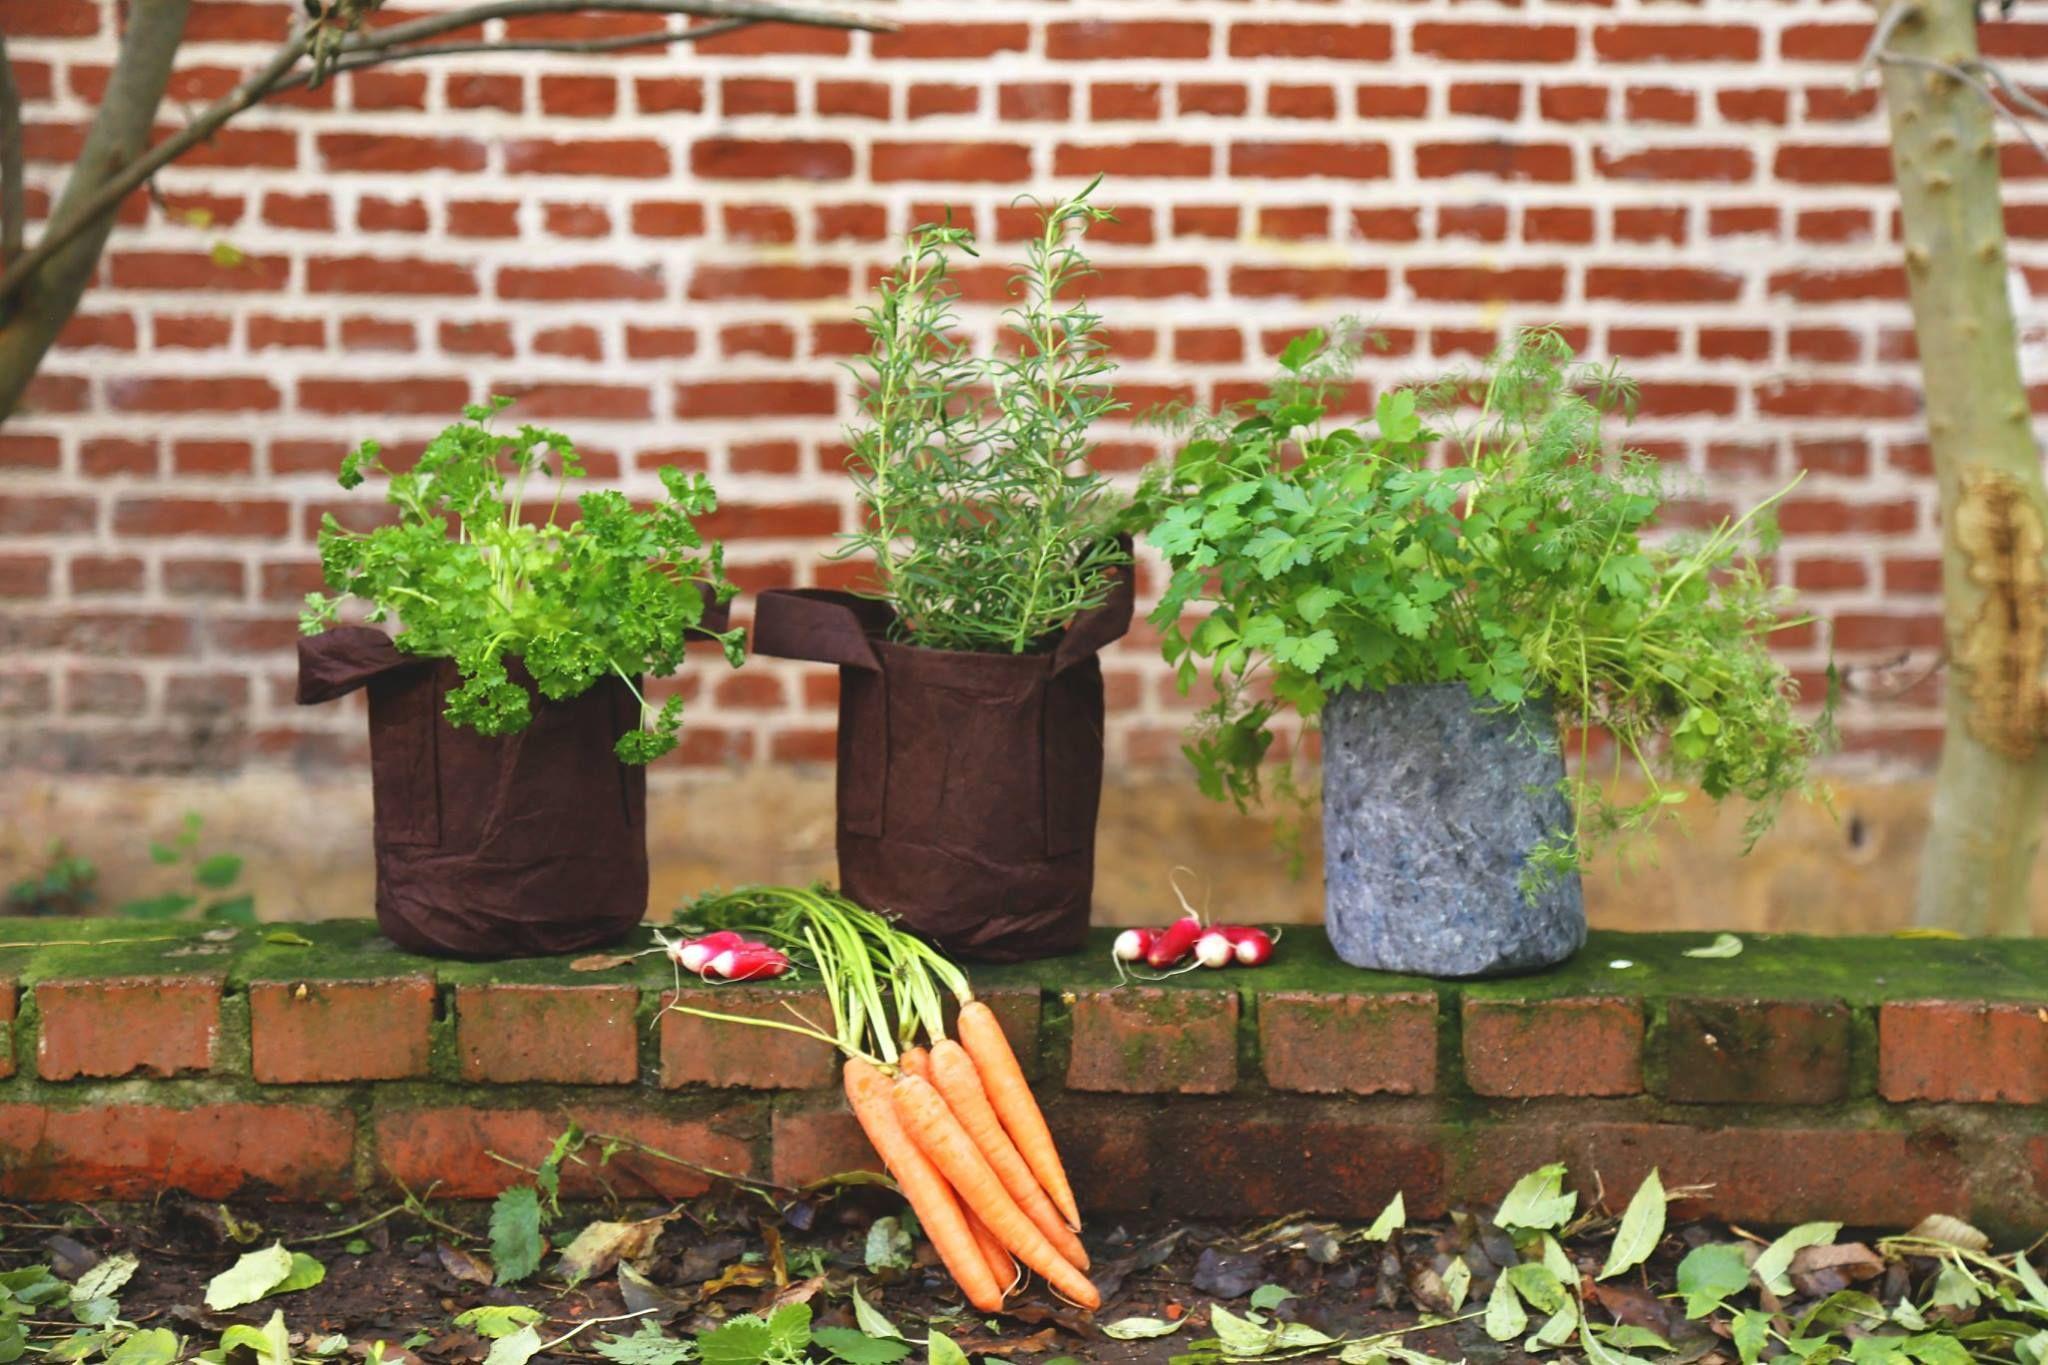 persil romarin coriandre conseils de jardinage. Black Bedroom Furniture Sets. Home Design Ideas